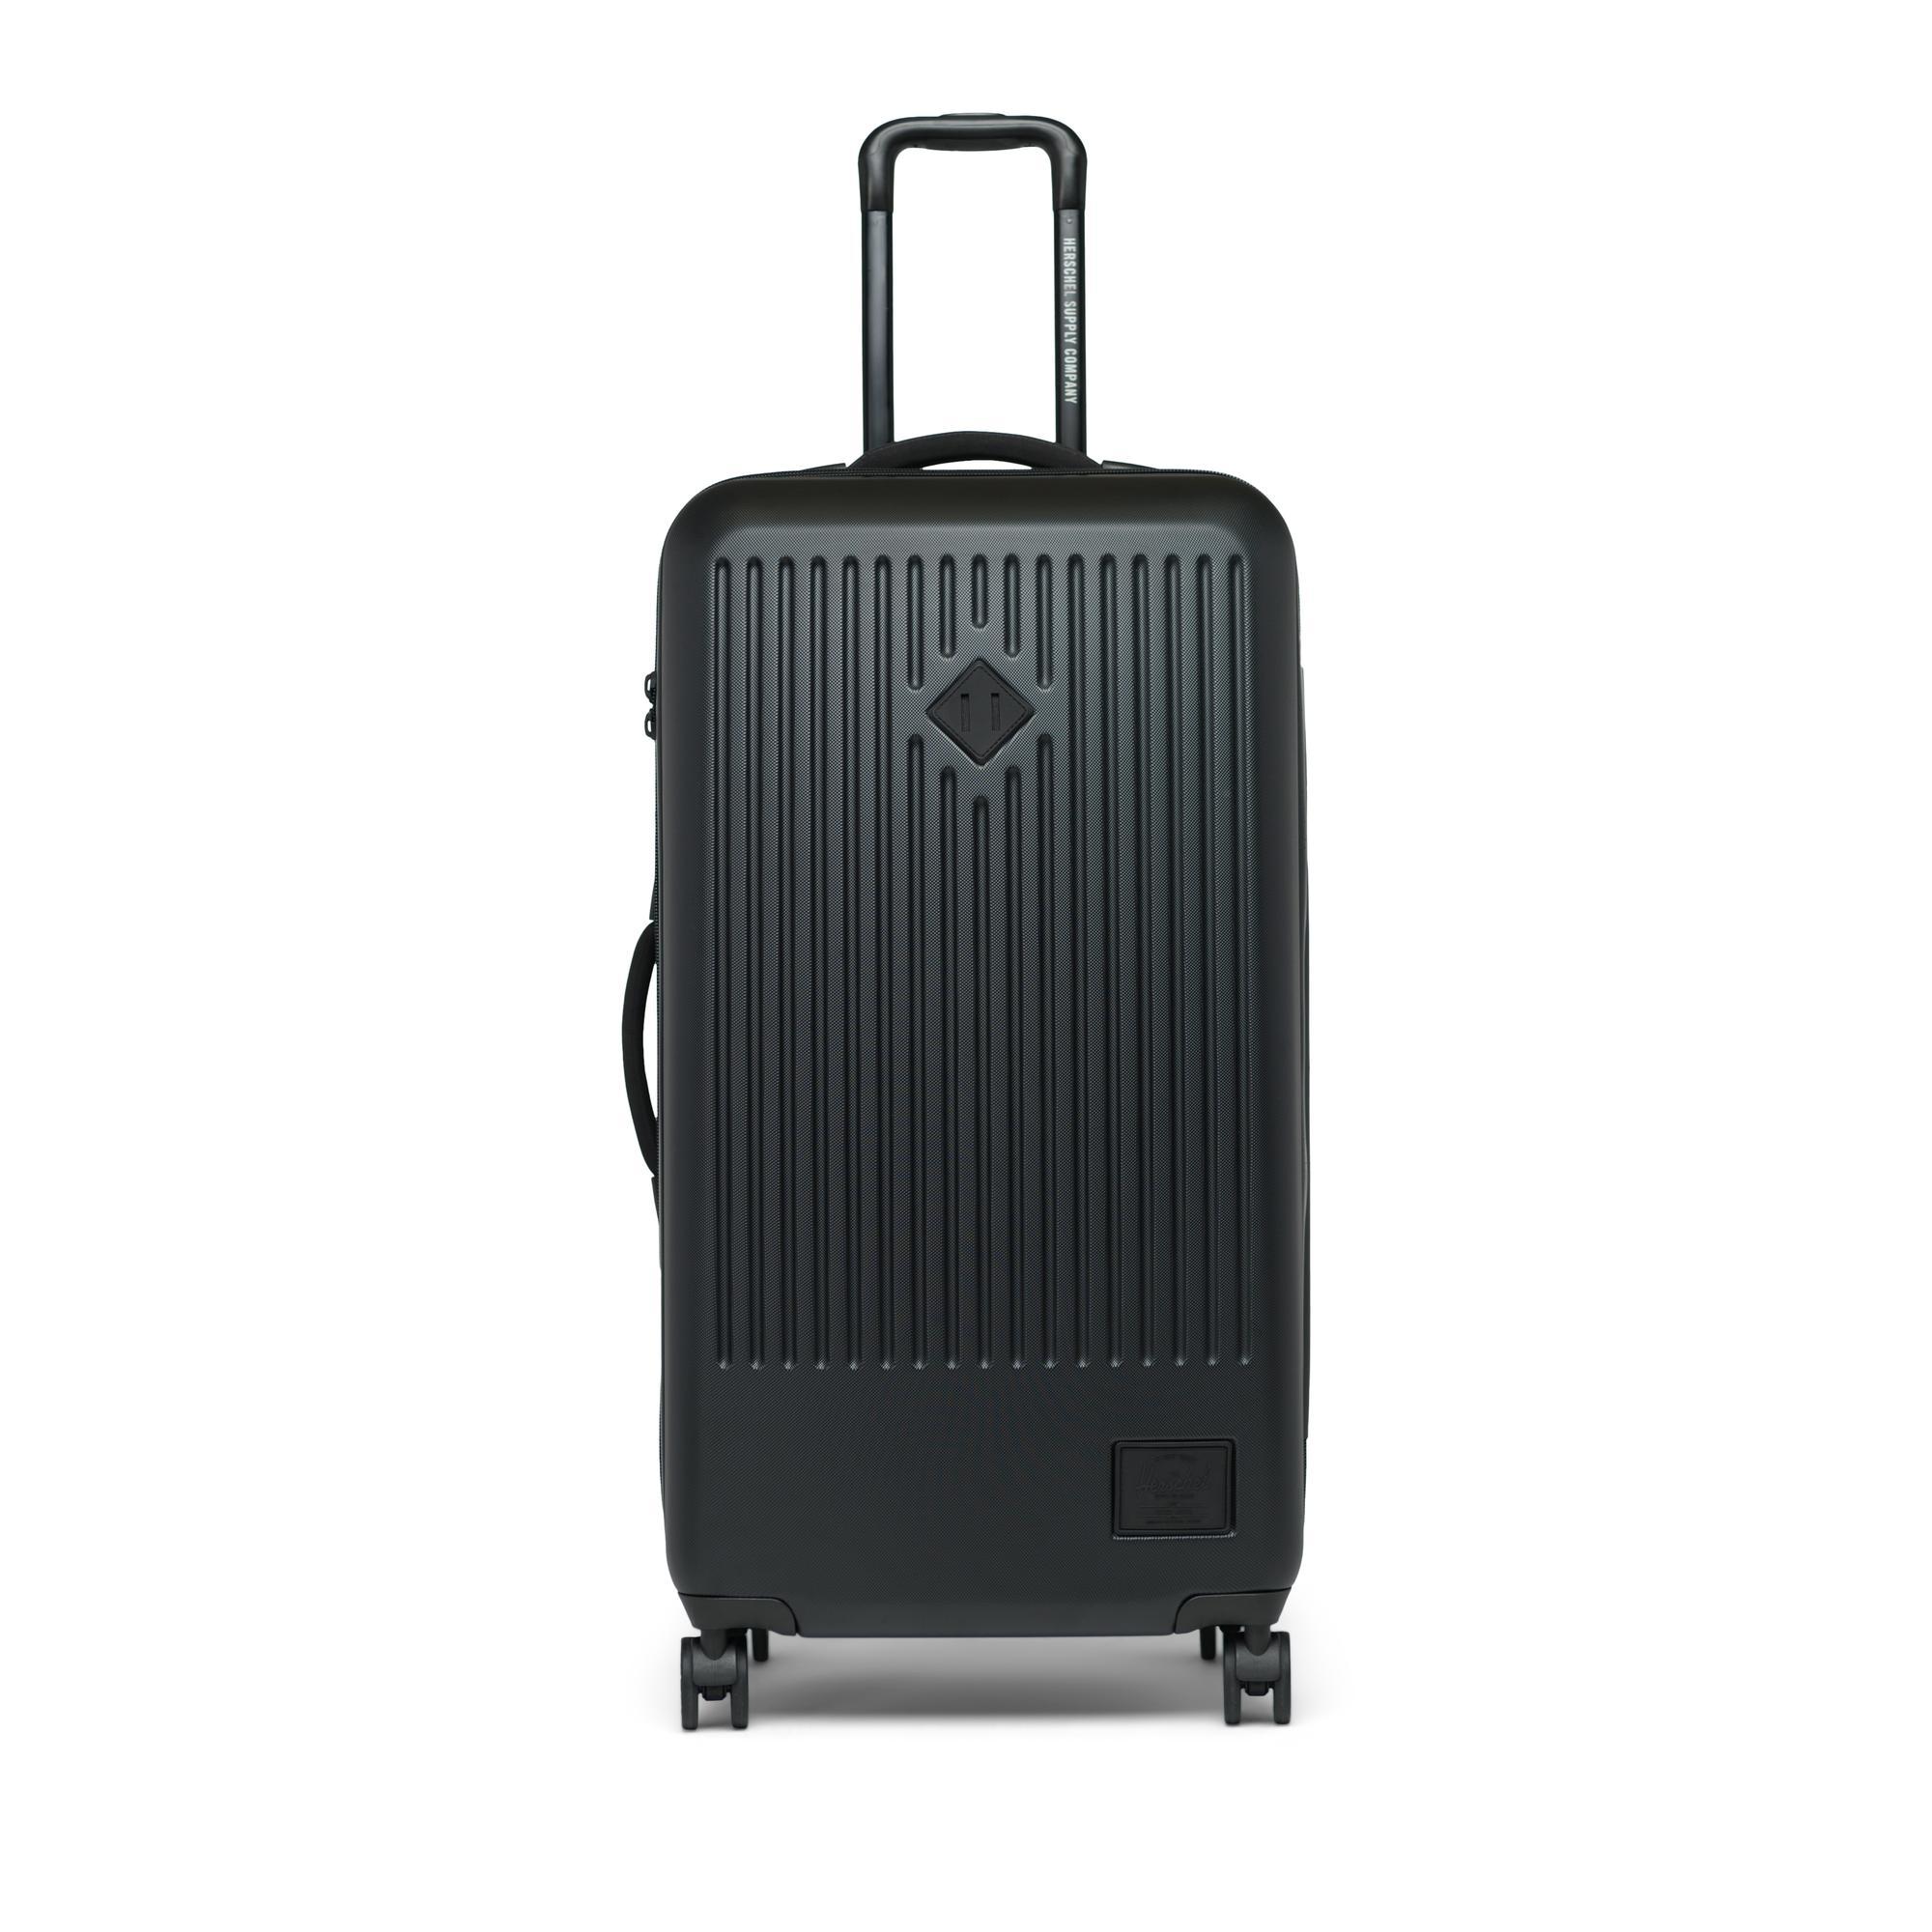 7e2ac711c1 Trade Luggage Large